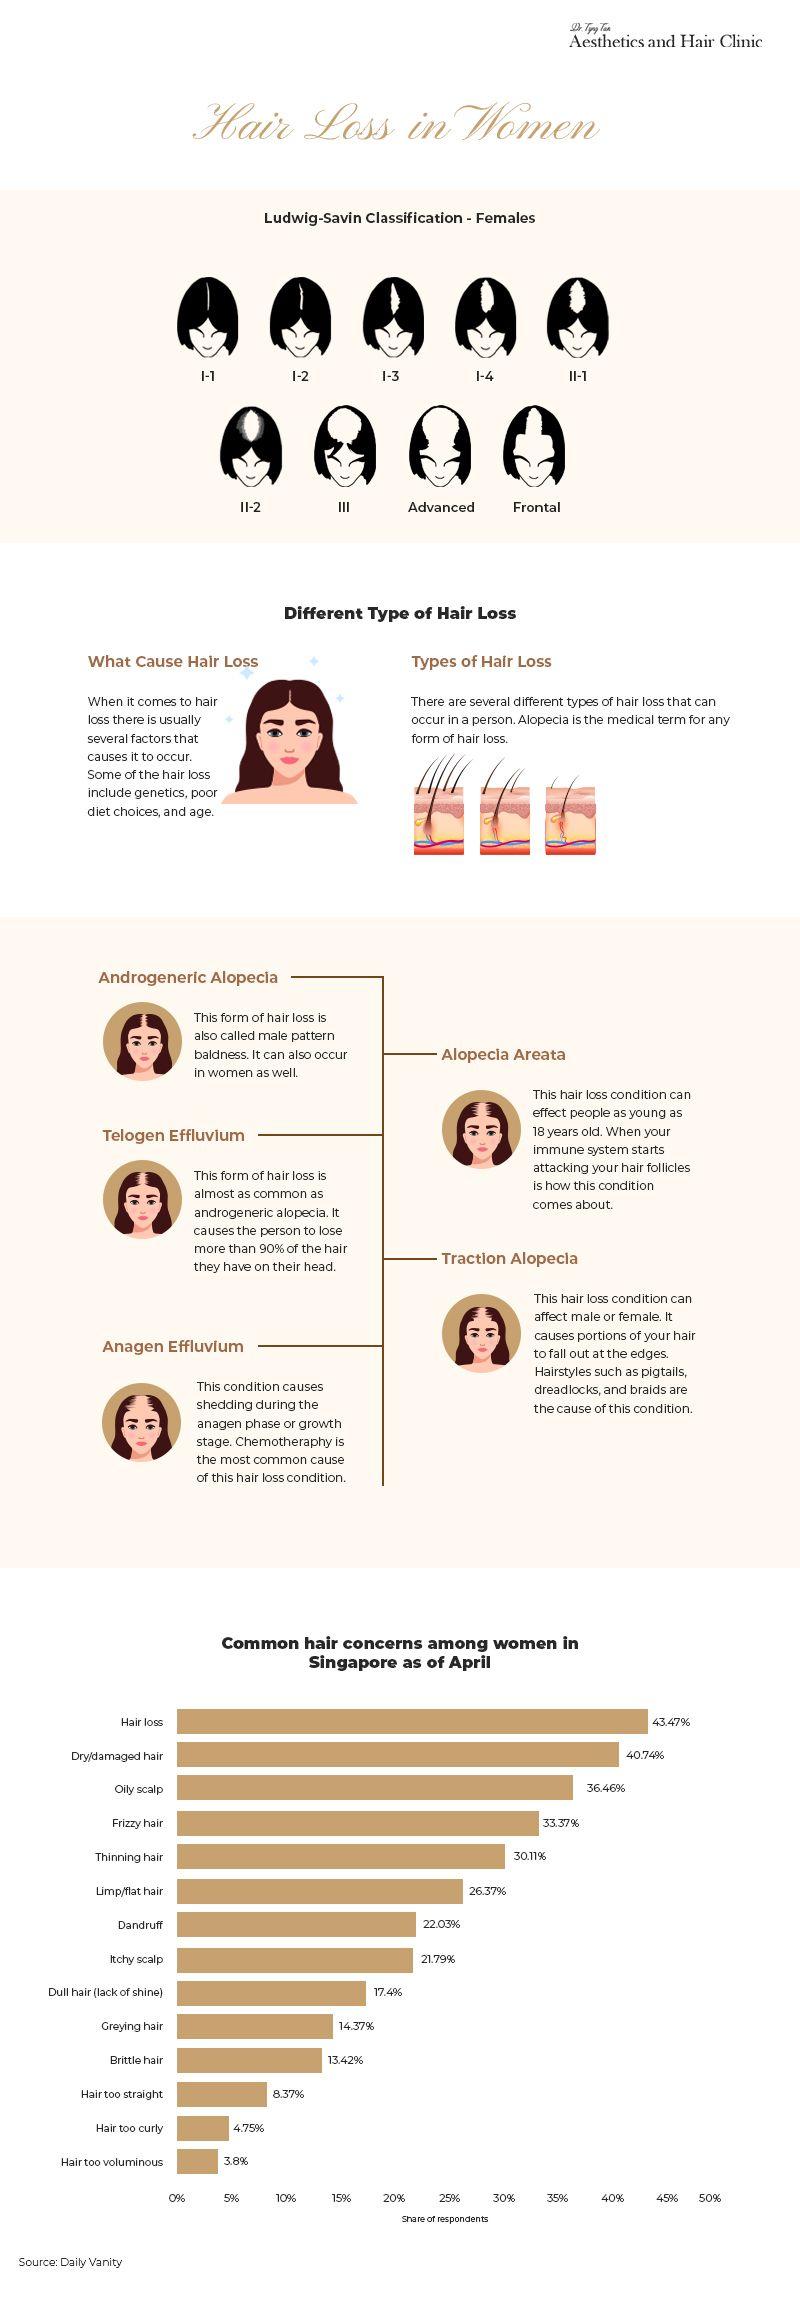 Hair Loss In Singapore Women